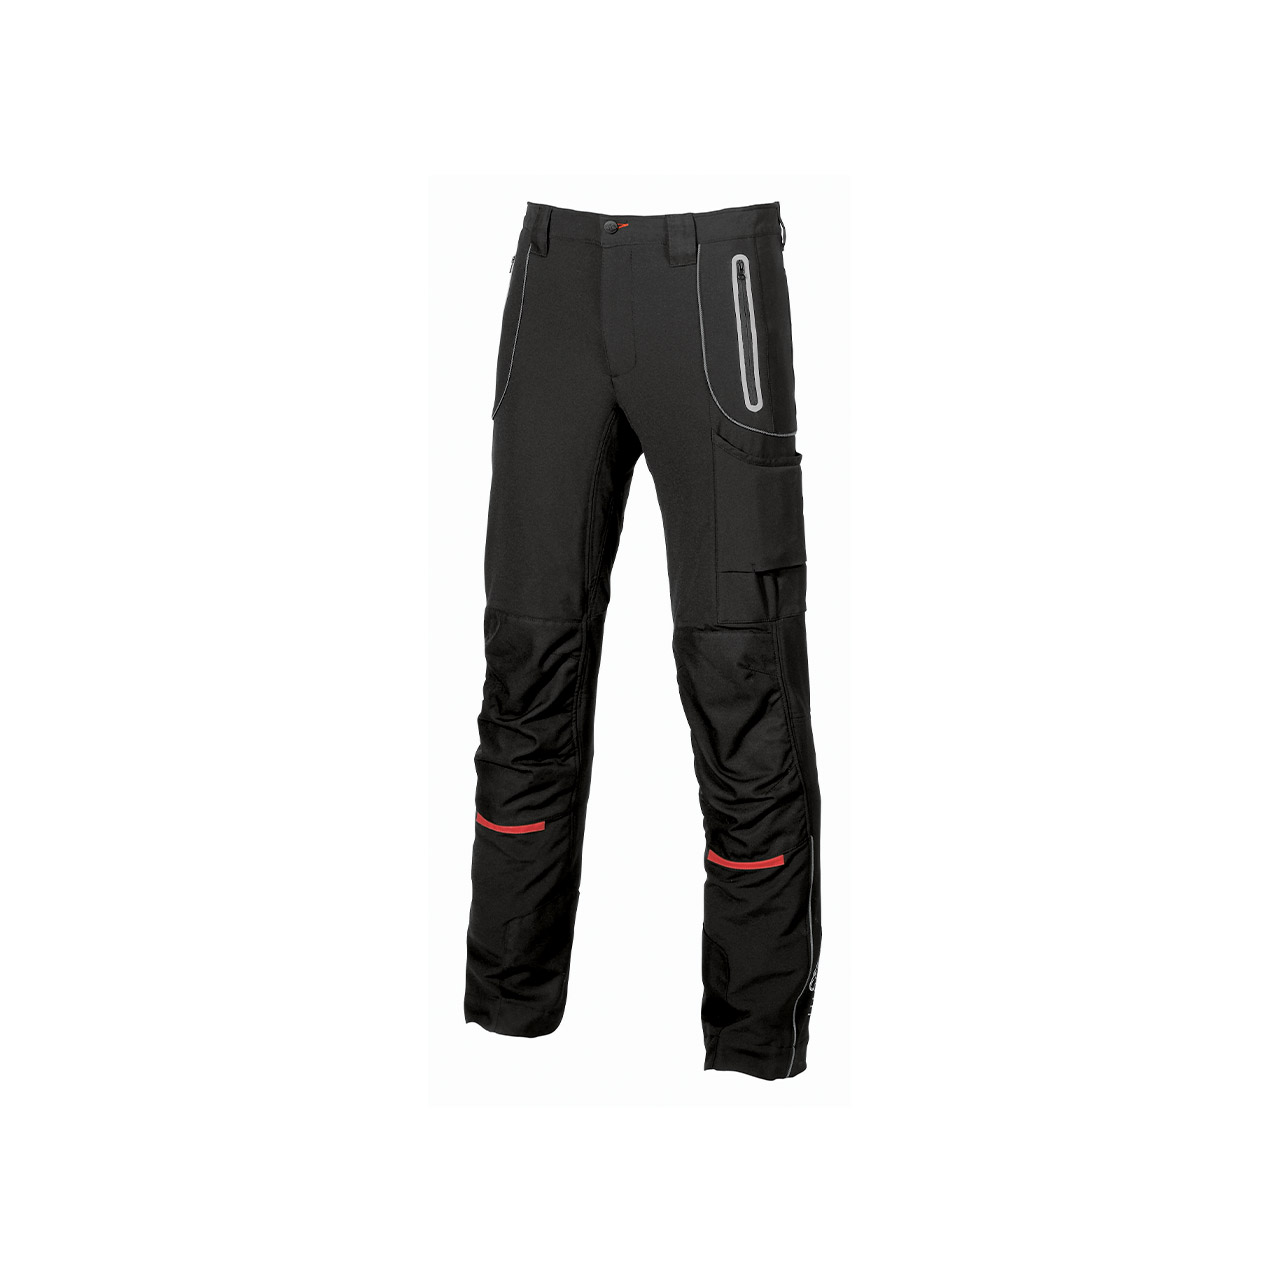 Pantalone Lungo Invernale UPower Modello Pit